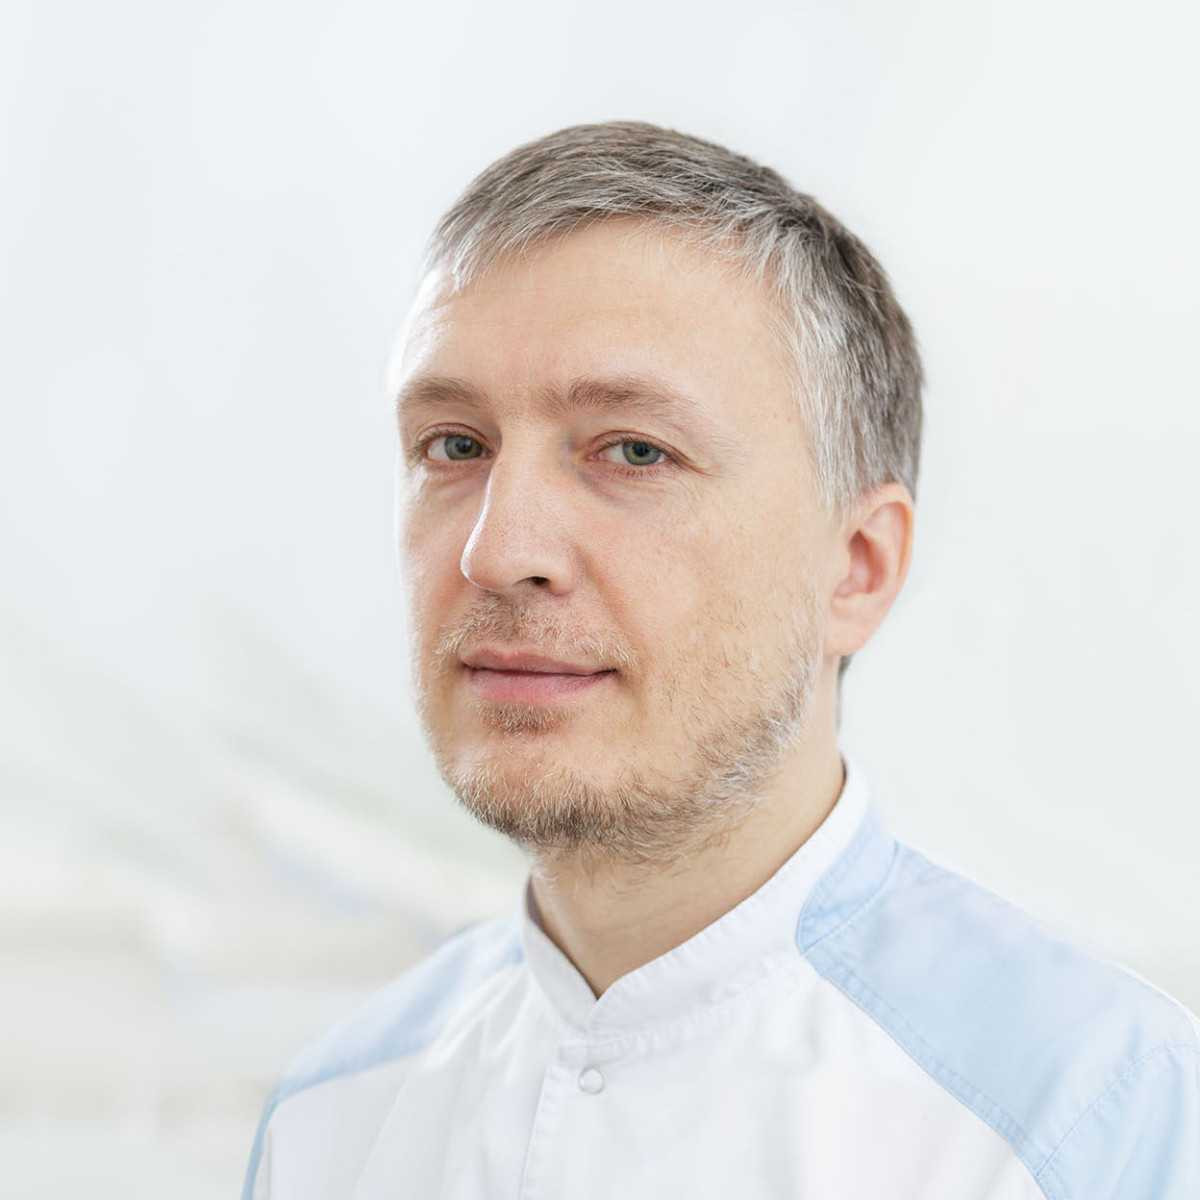 Торсунов Вячеслав Леонидович - фотография